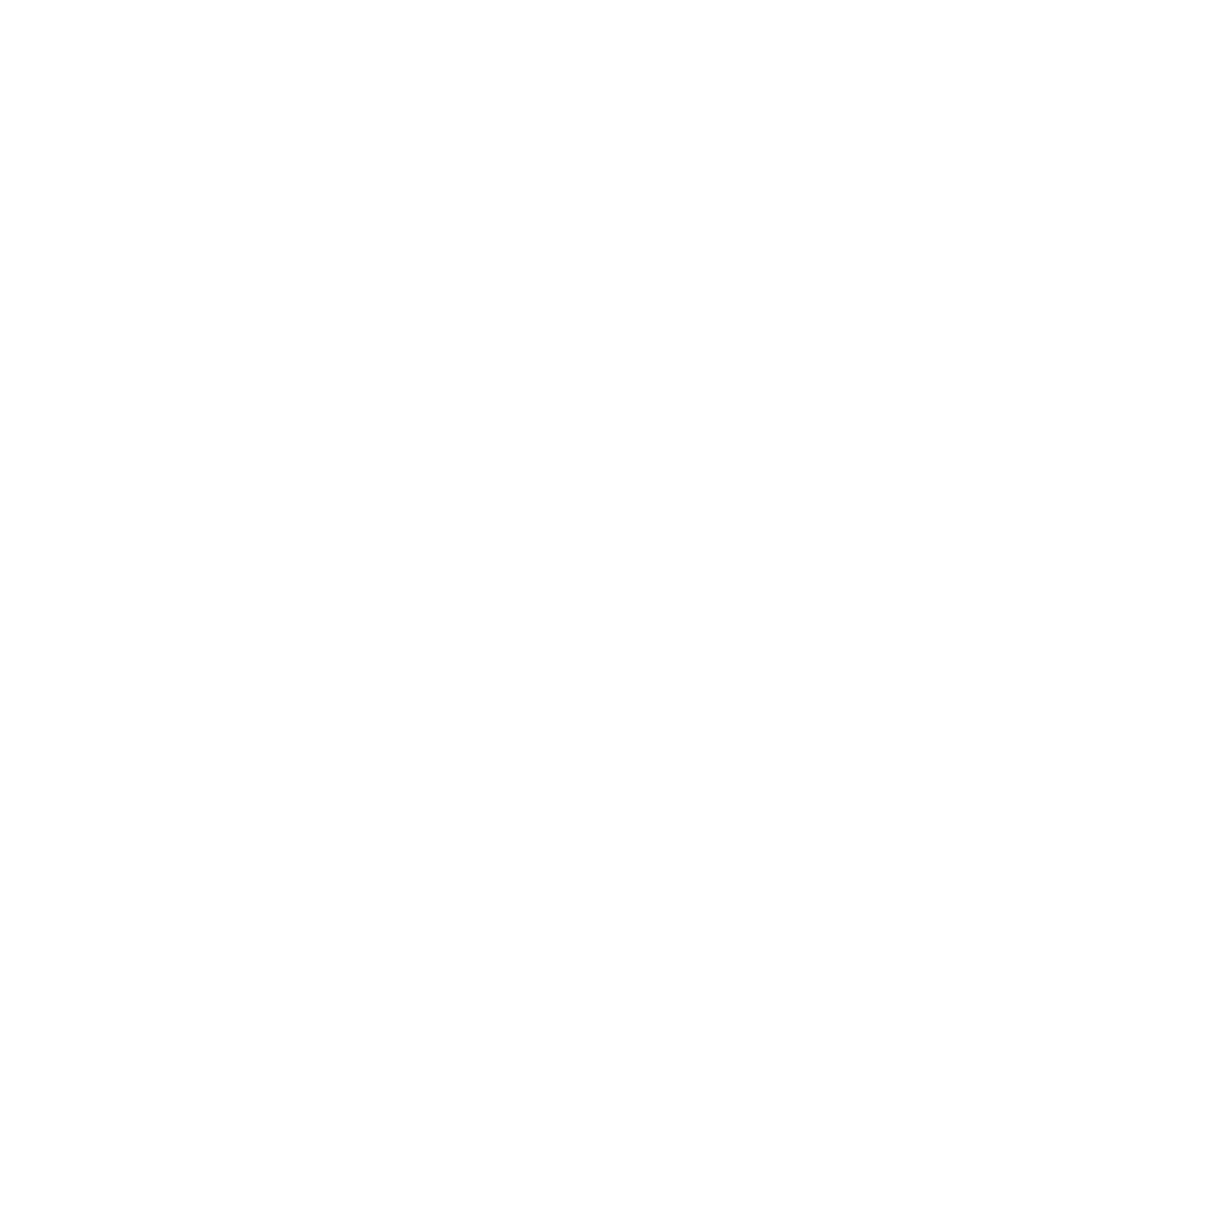 Clearbox Symbol RGB WO 300dpi